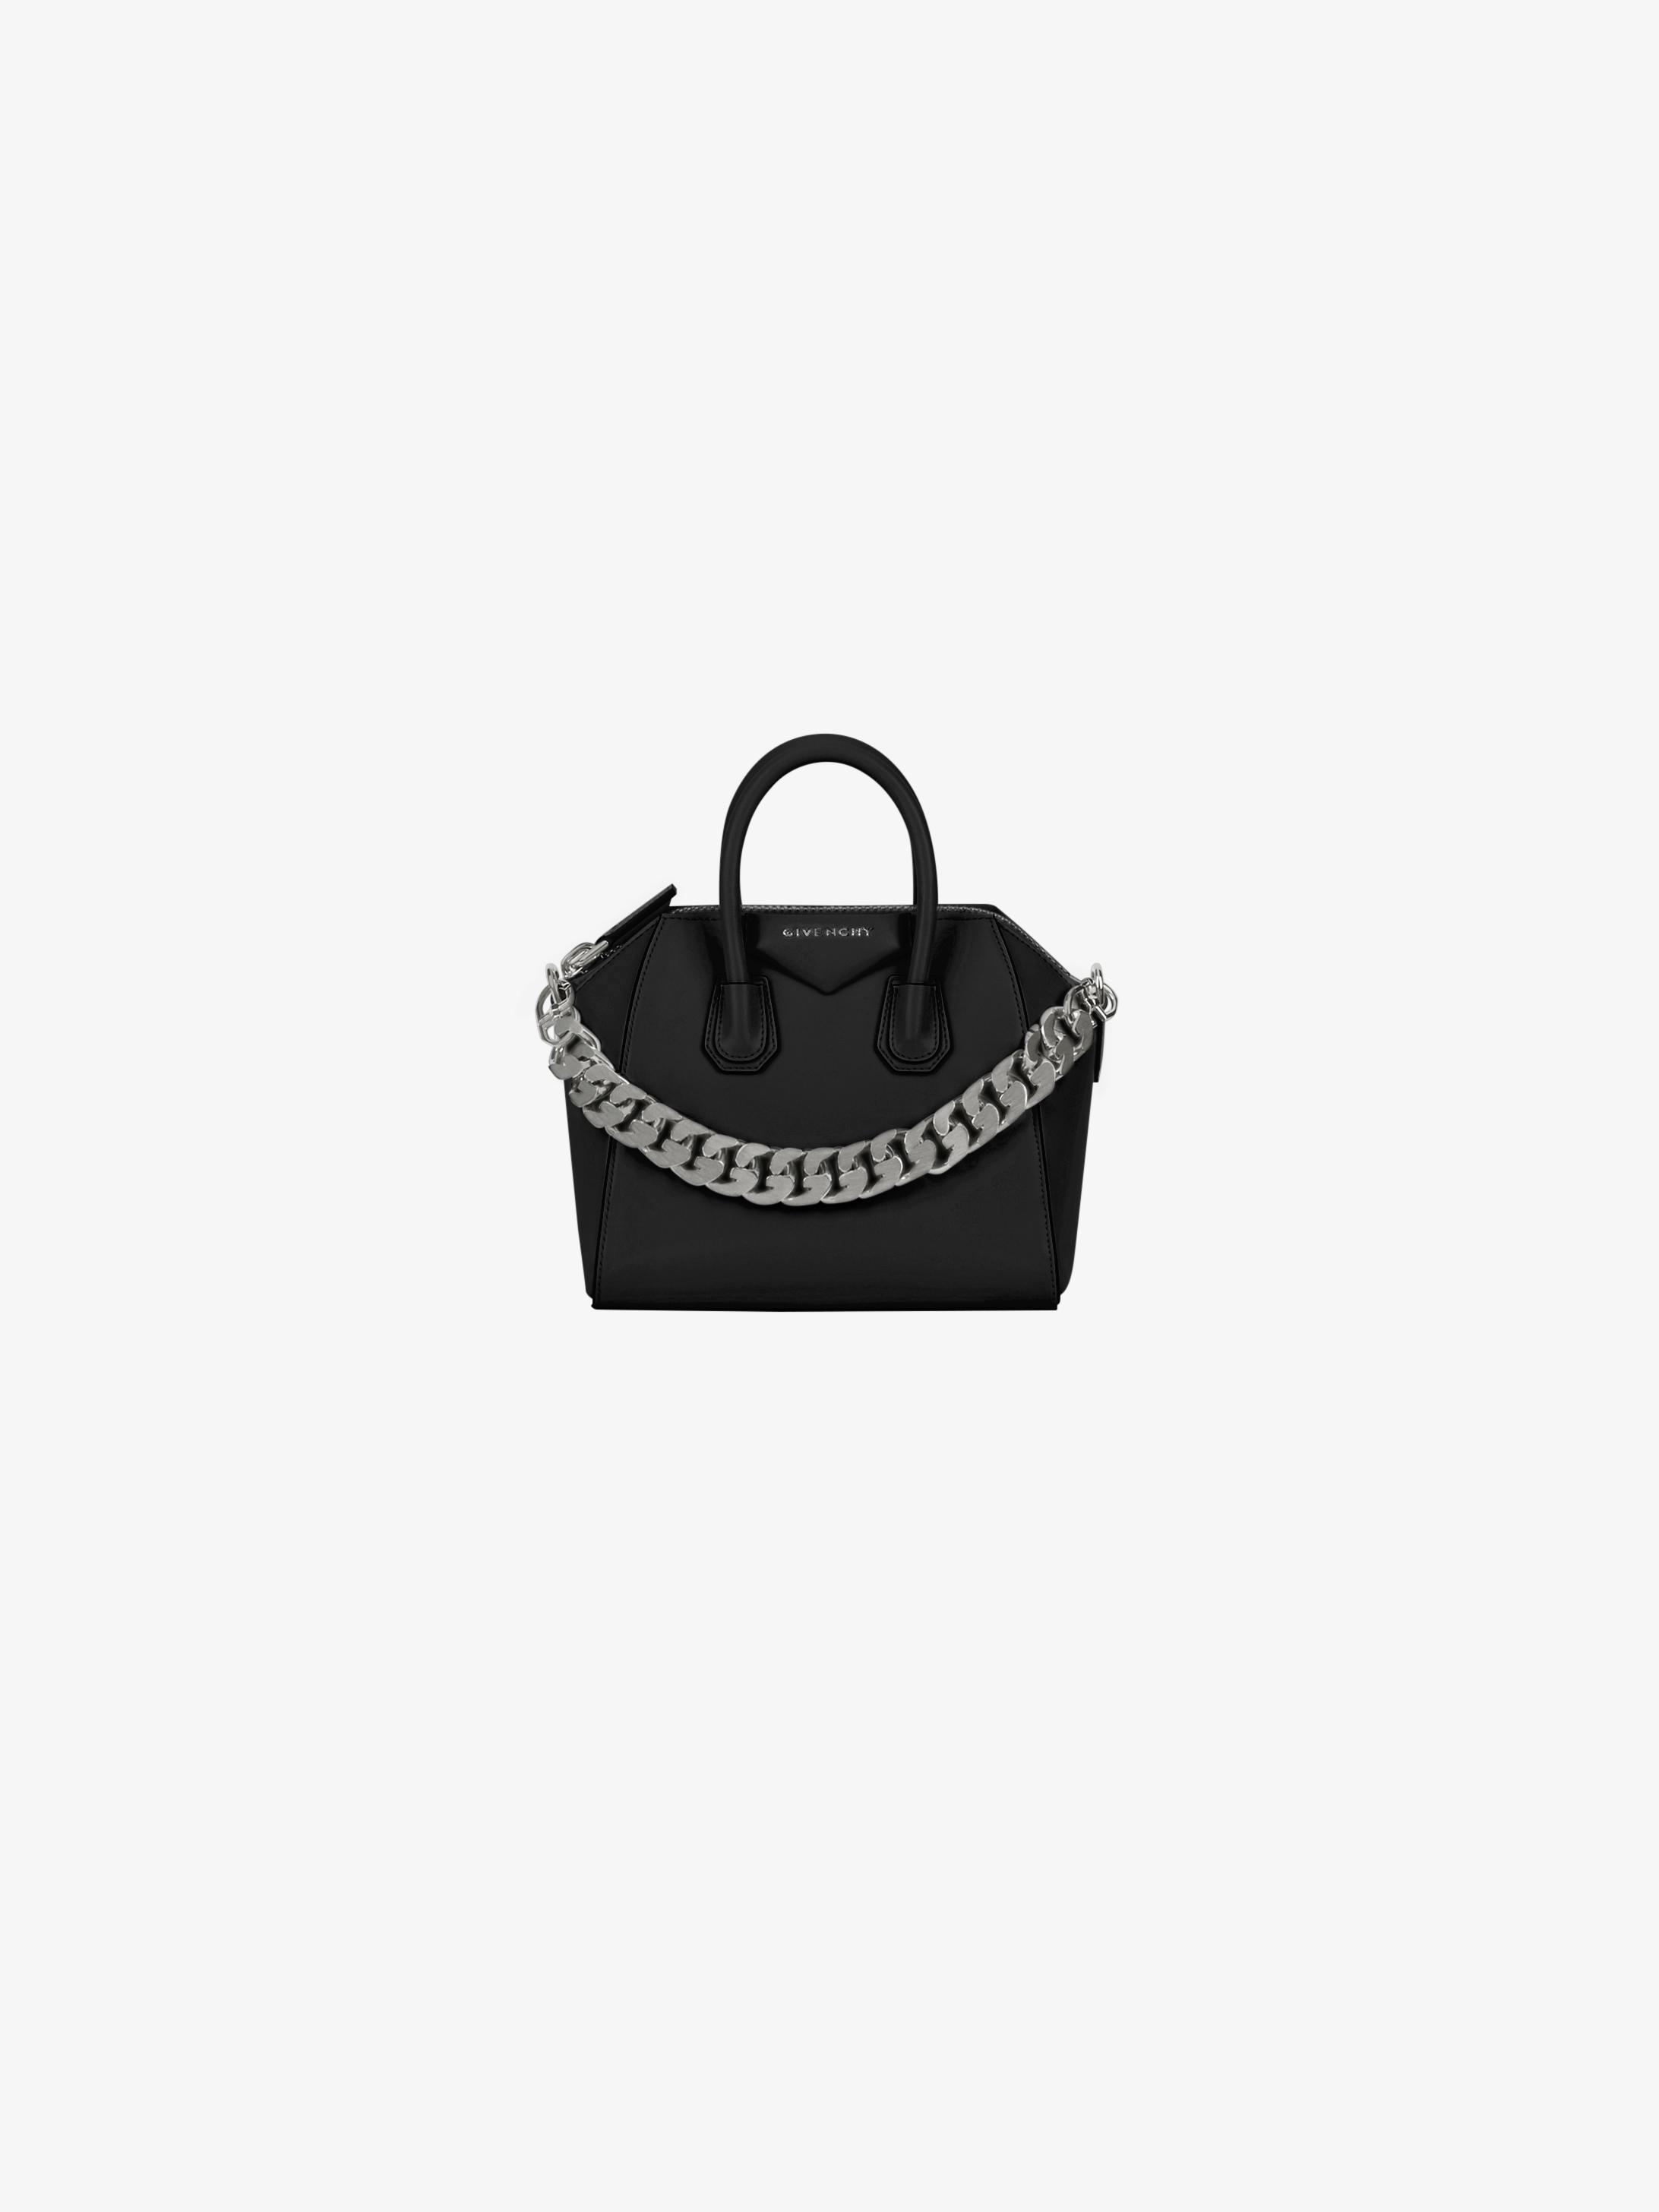 Mini Antigona bag in box leather with chain